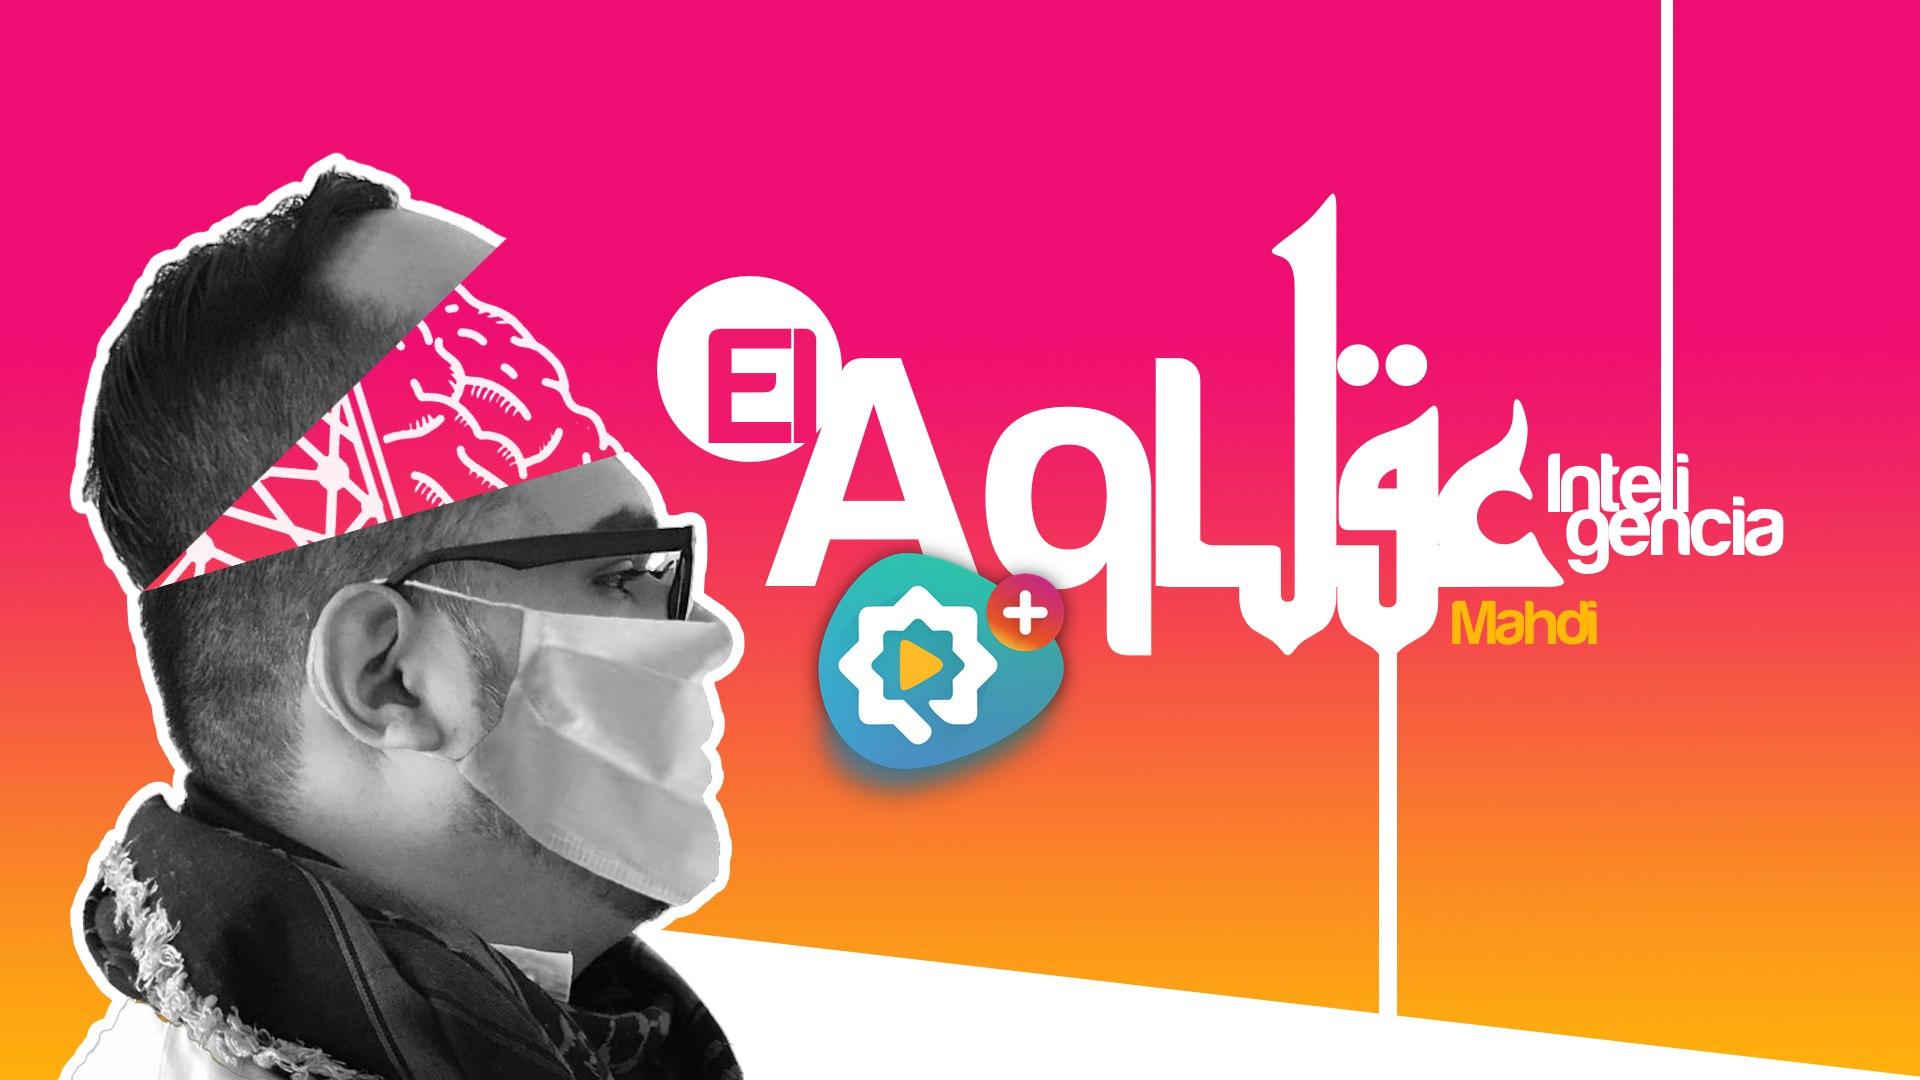 EL AQL (Inteligecia)